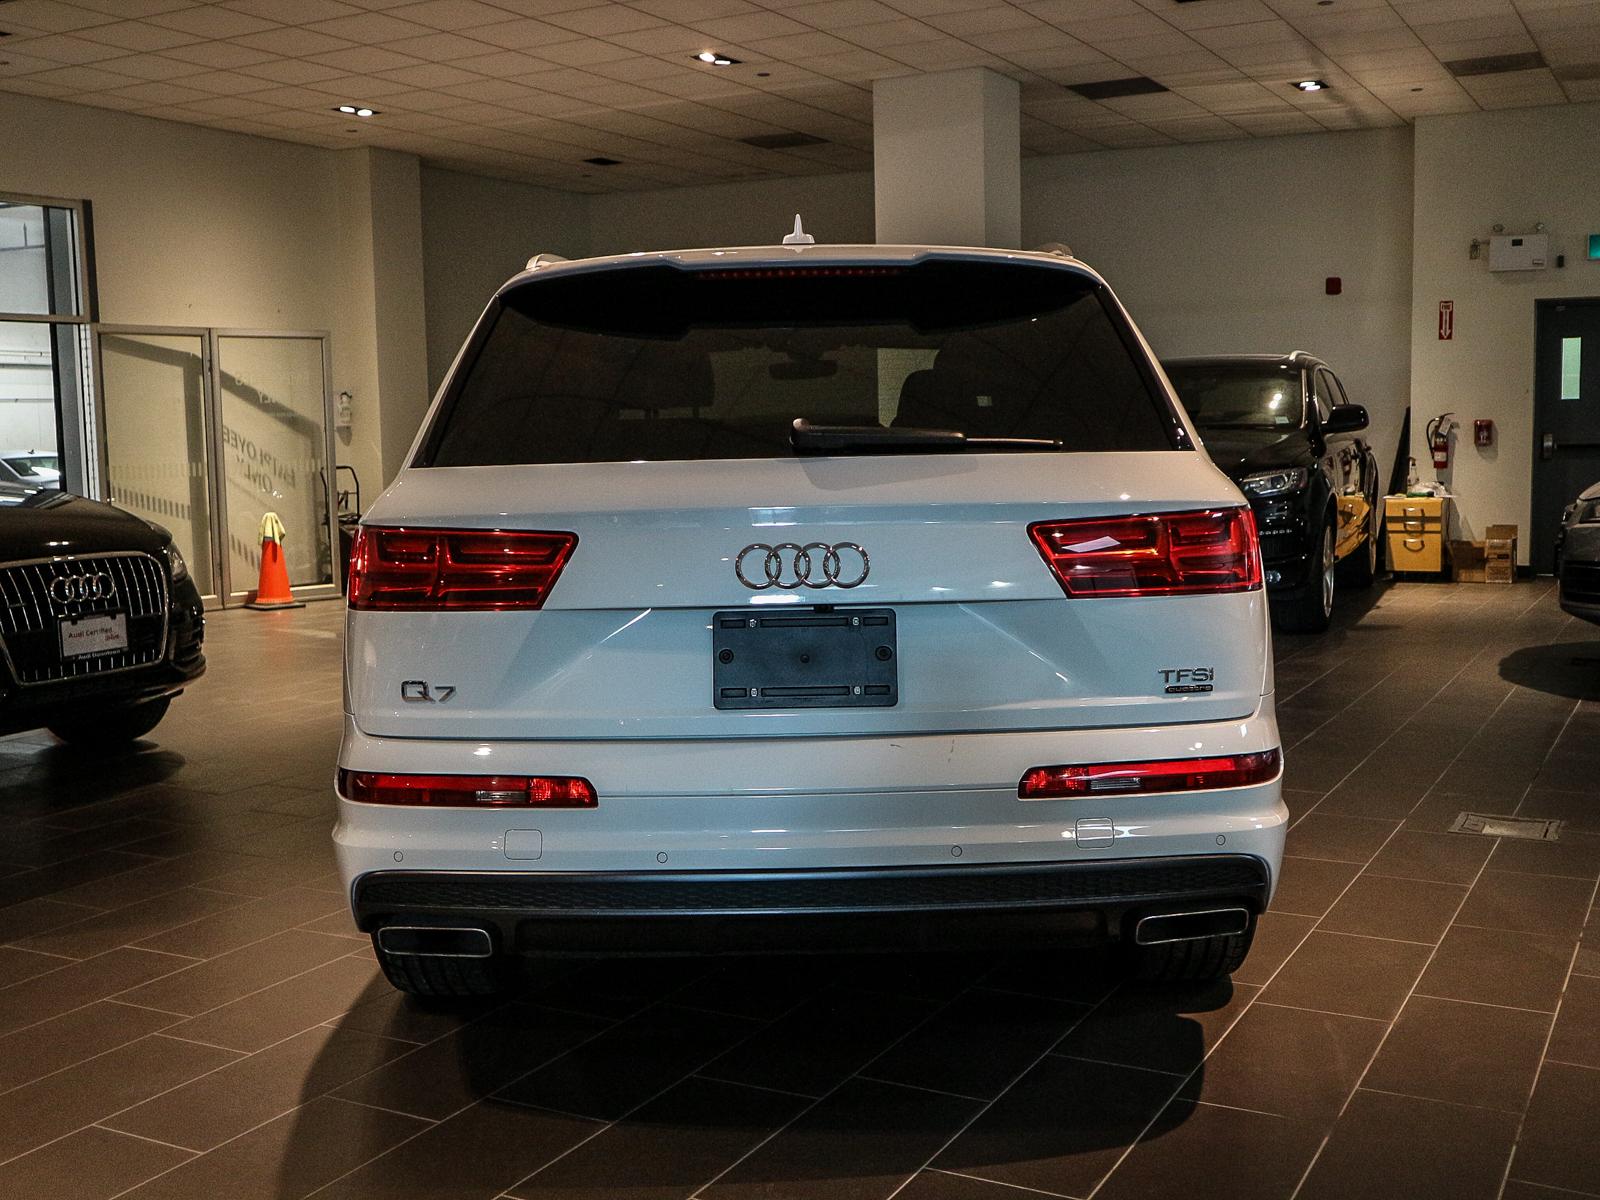 Used 2018 Audi Q7 in Toronto,ON